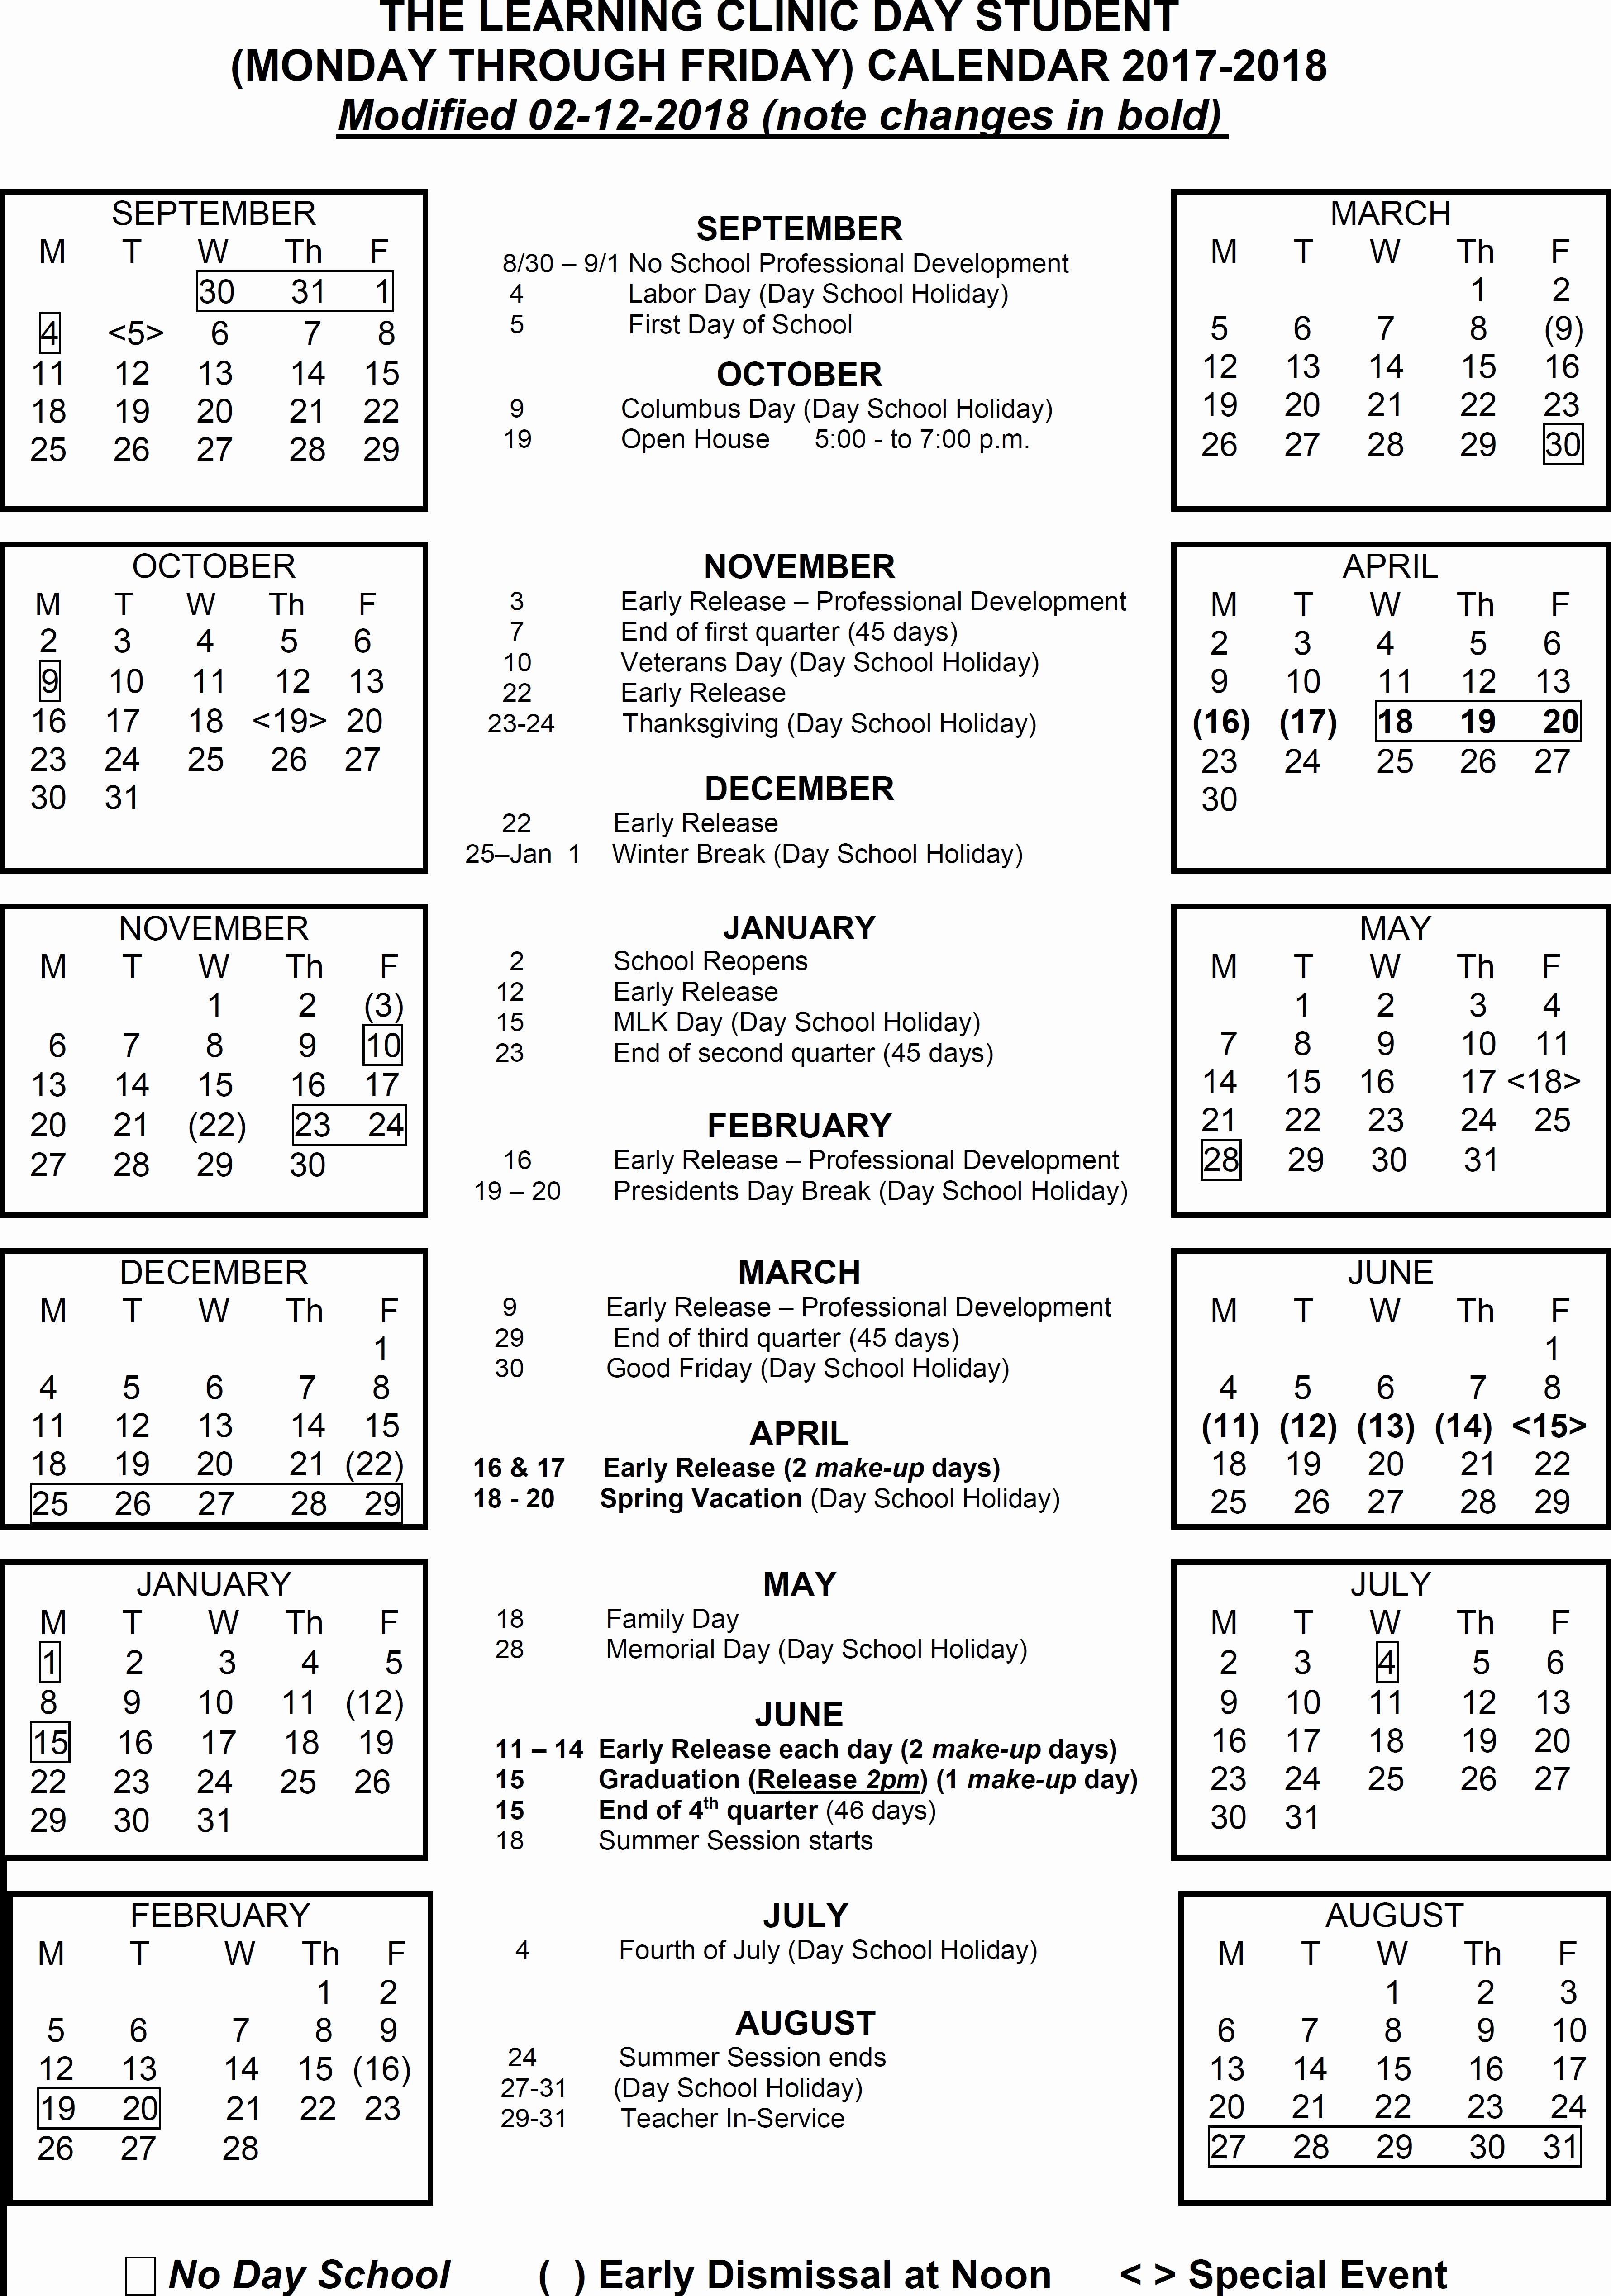 Uconn Academic Calendar 2018 2019 2017 2018 School Calendar The Calendar 2019 Uconn